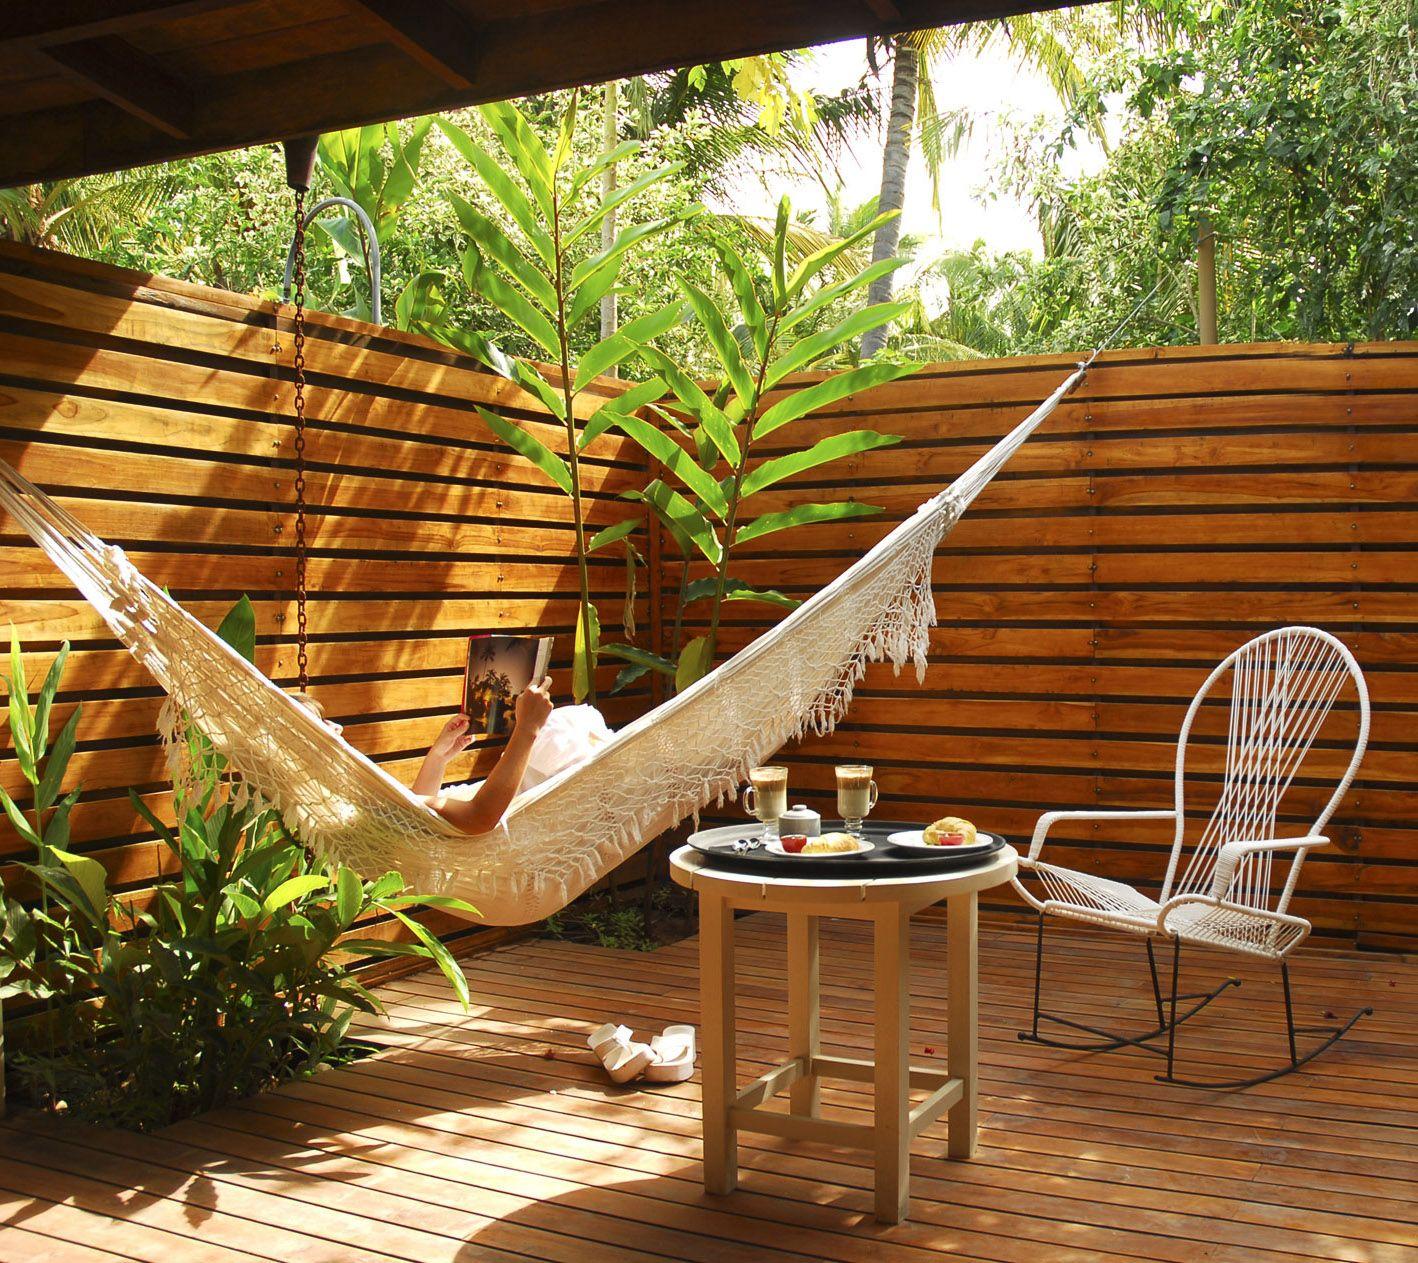 Hammock wood patio the harmony hotel costa rica interior